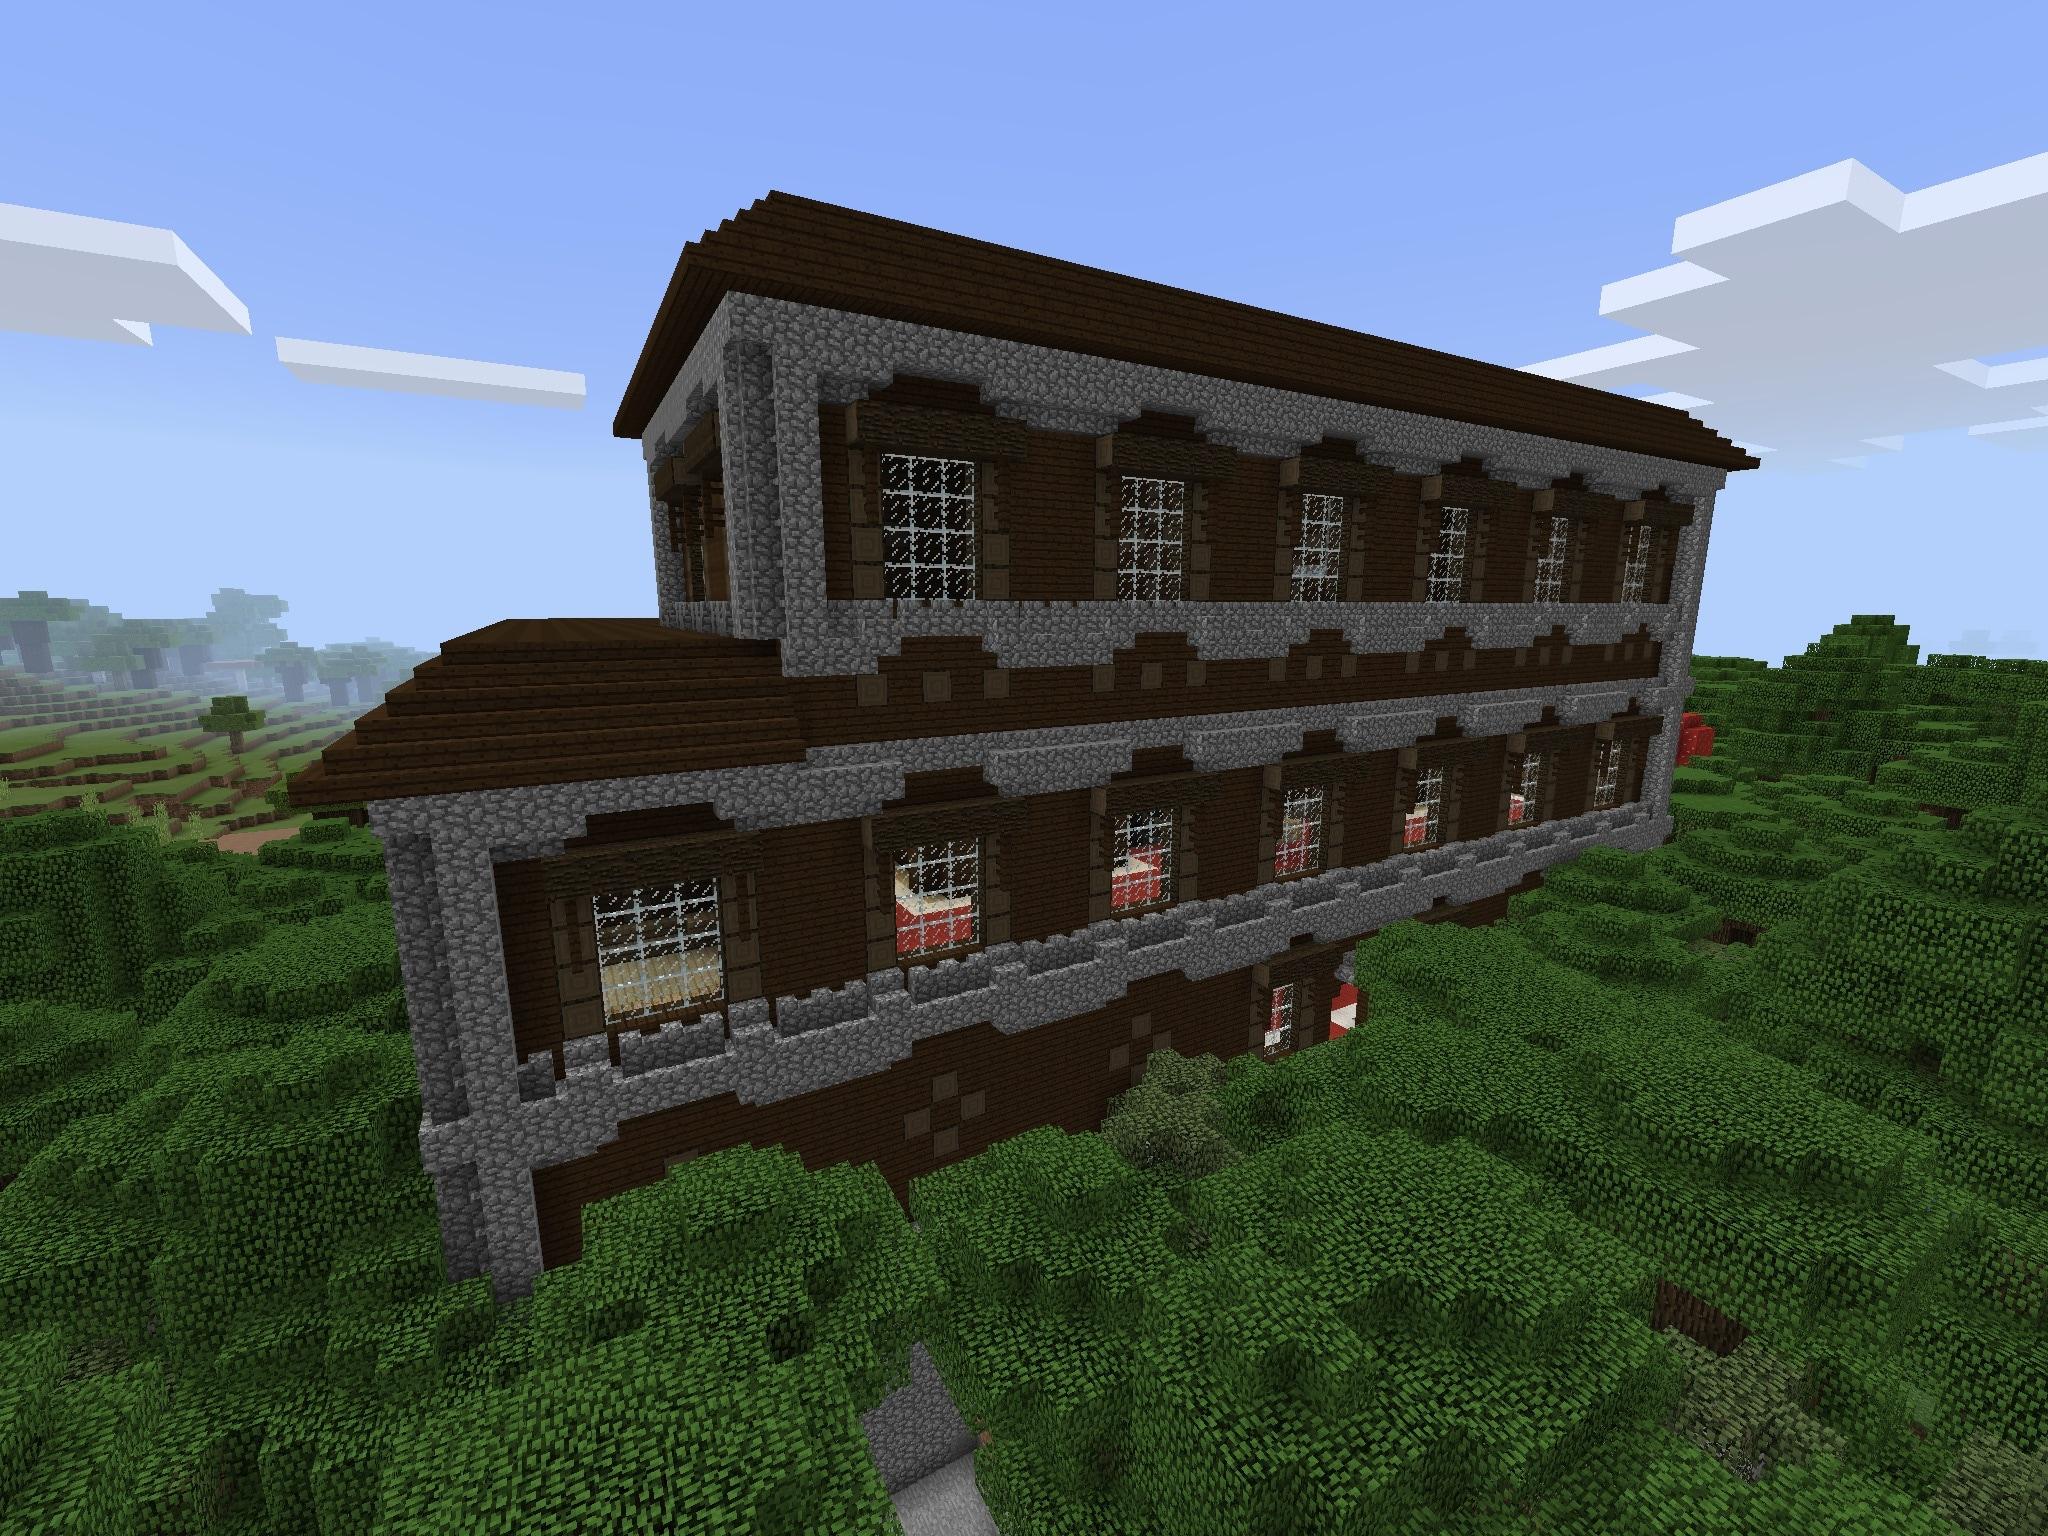 Woodland Mansion Less than 700 Blocks from Spawn - Minecraft